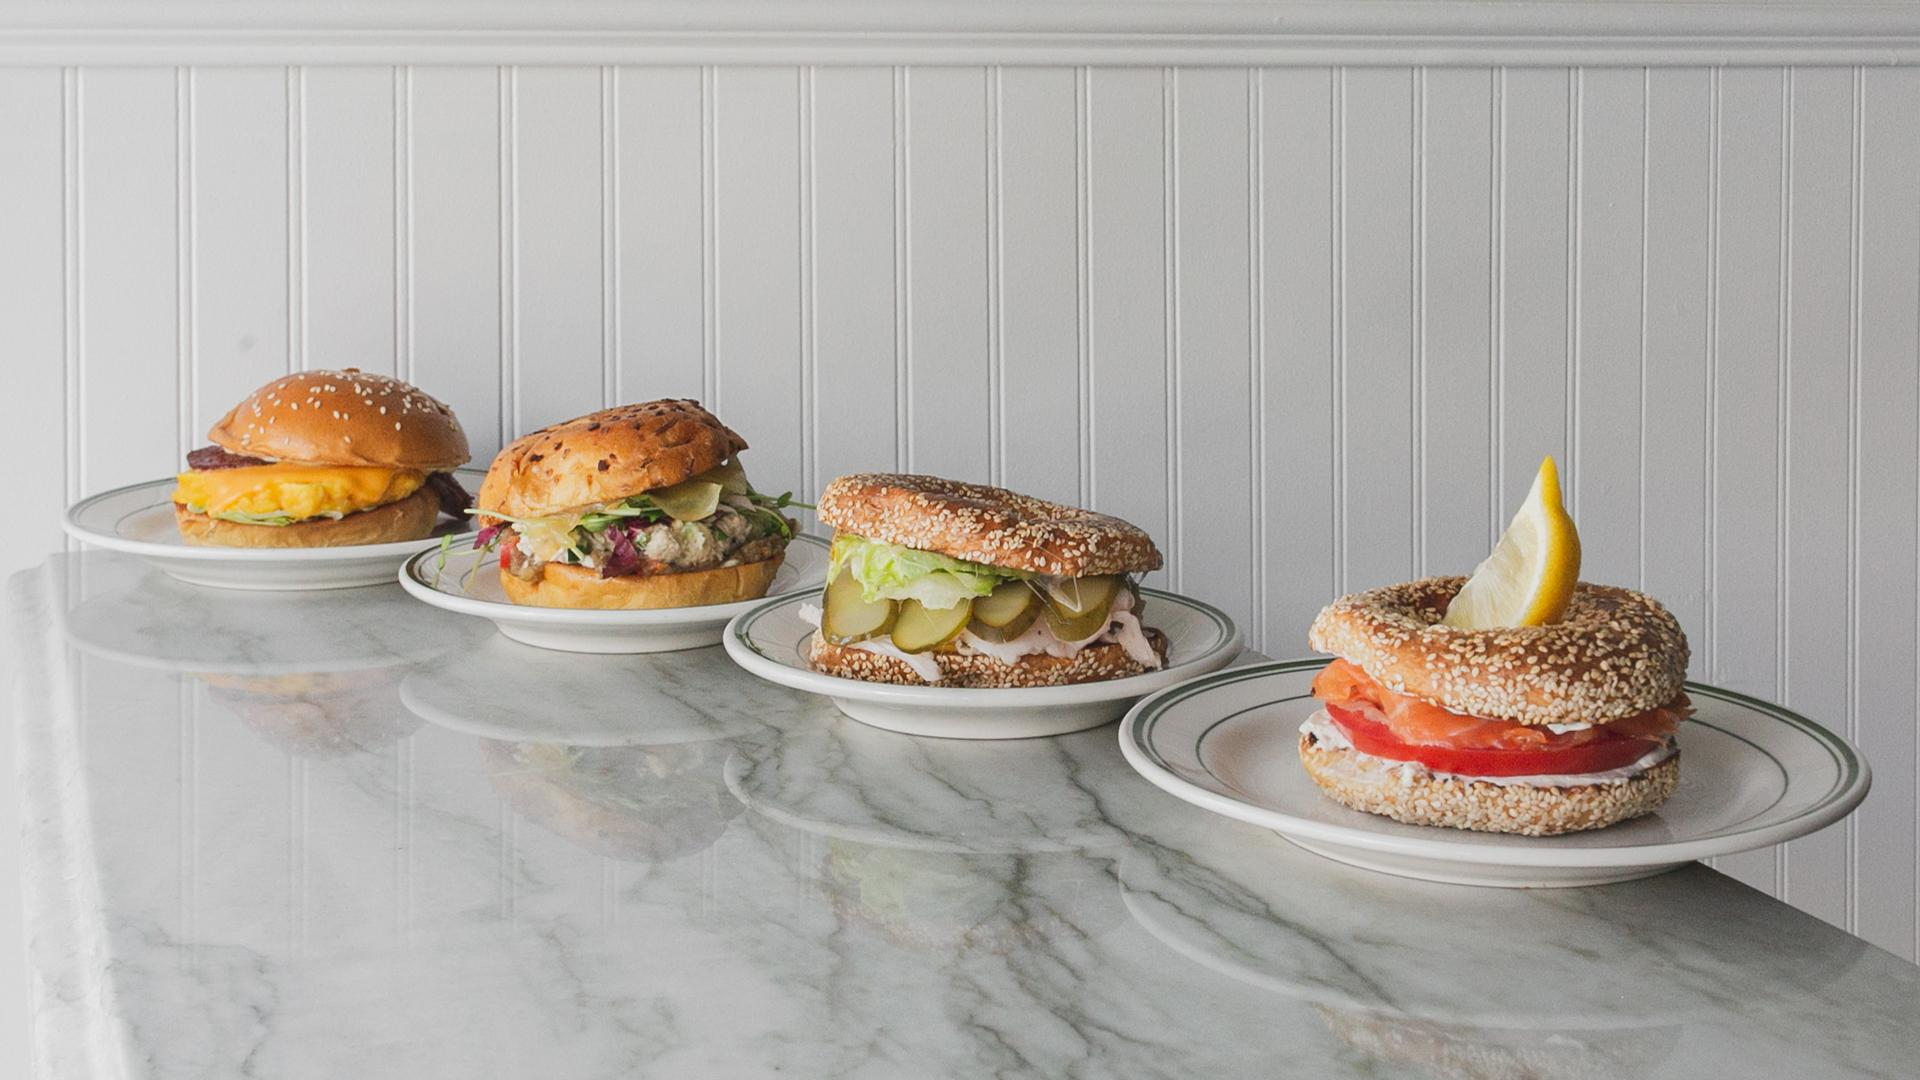 Montreal bagels | Bagel sandwiches at Arthurs Nosh Bar